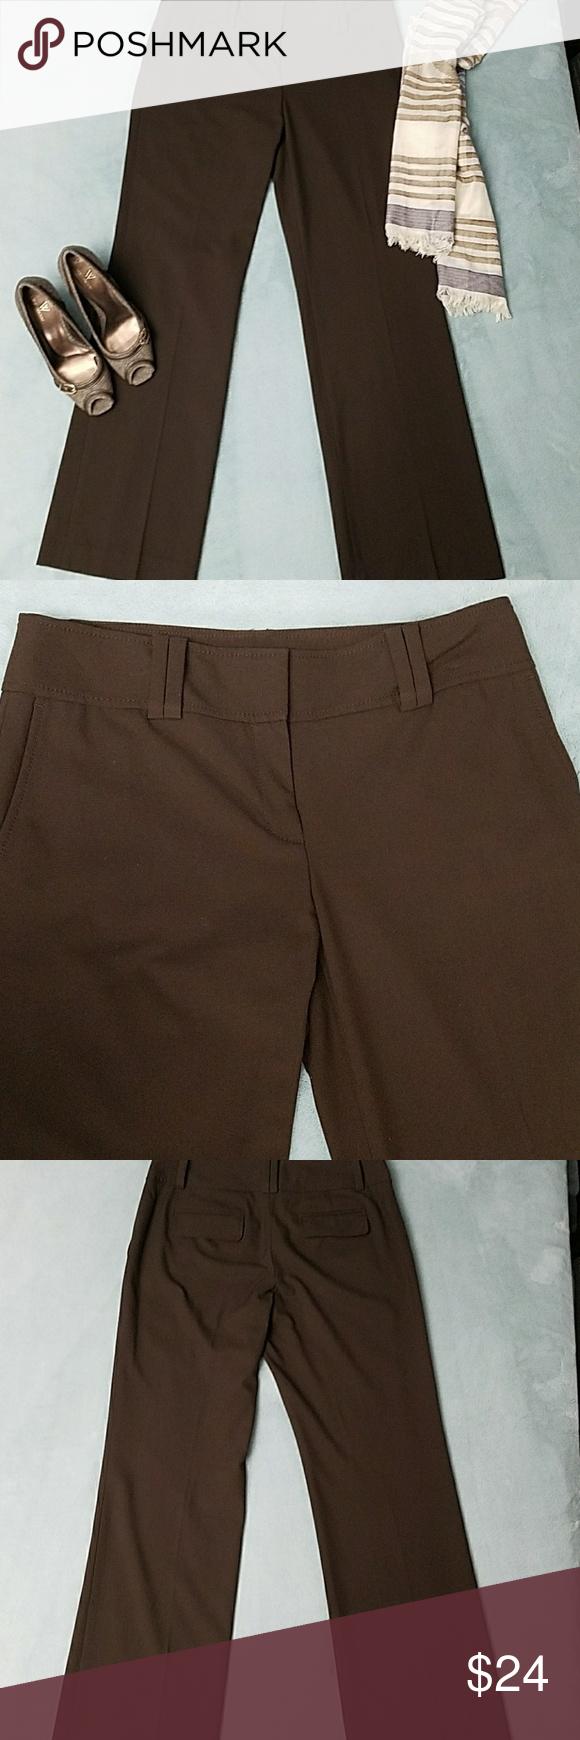 Ann taylor brown dress pants dress pants casual chic and slacks